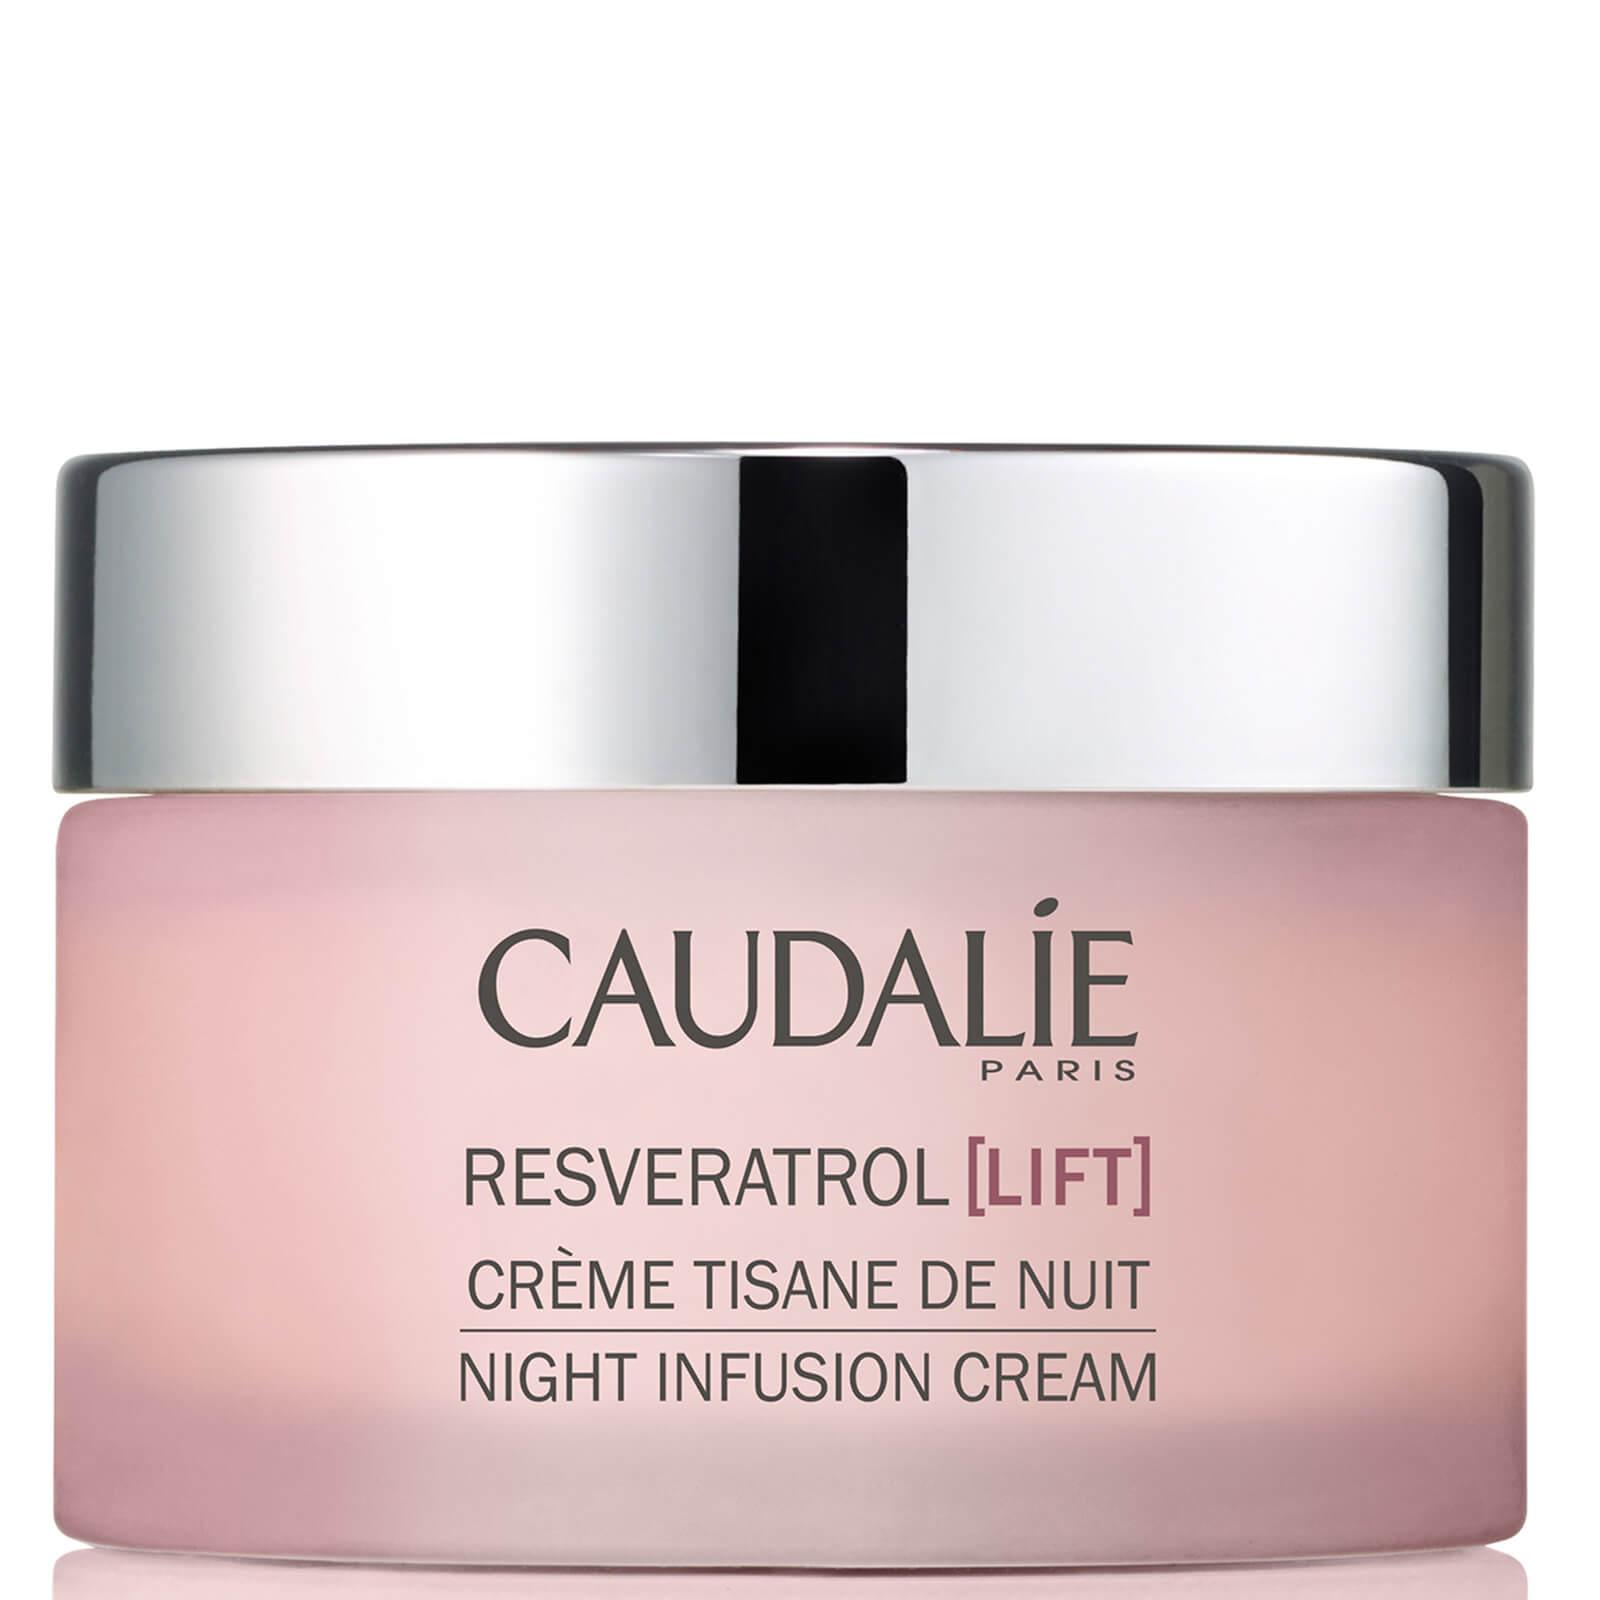 Caudalíe Resveratrol Lift Crema de Noche